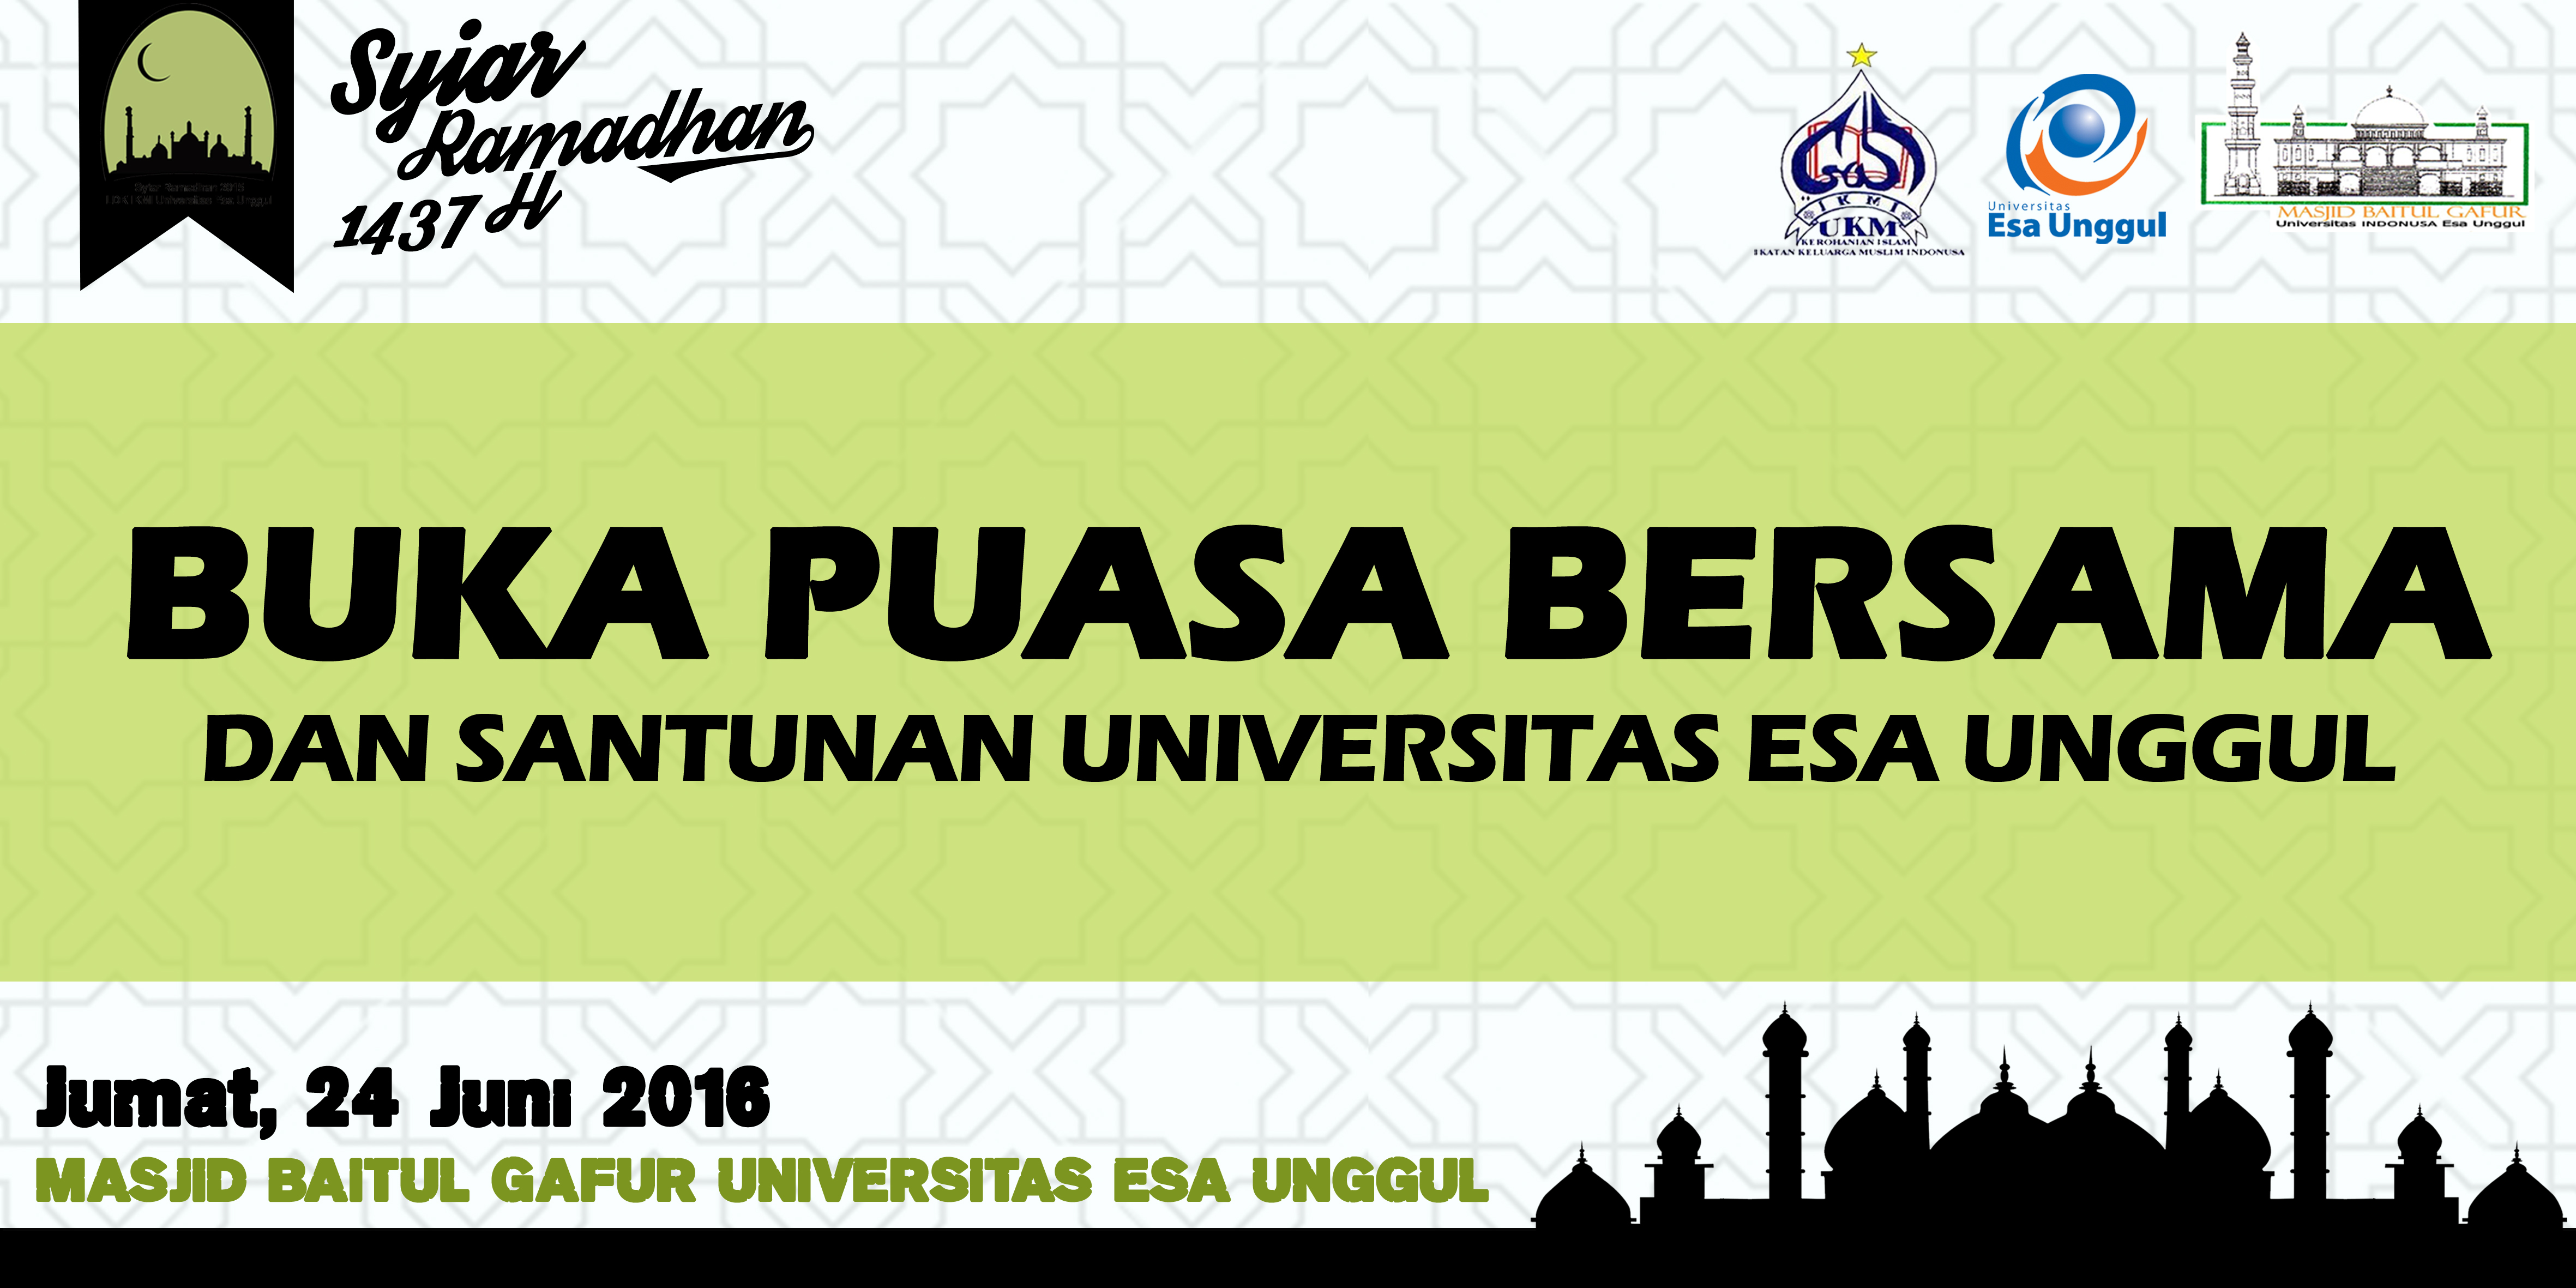 Rangkaian Kegiatan Buka Puasa Bersama dan Santunan Universitas Esa Unggul